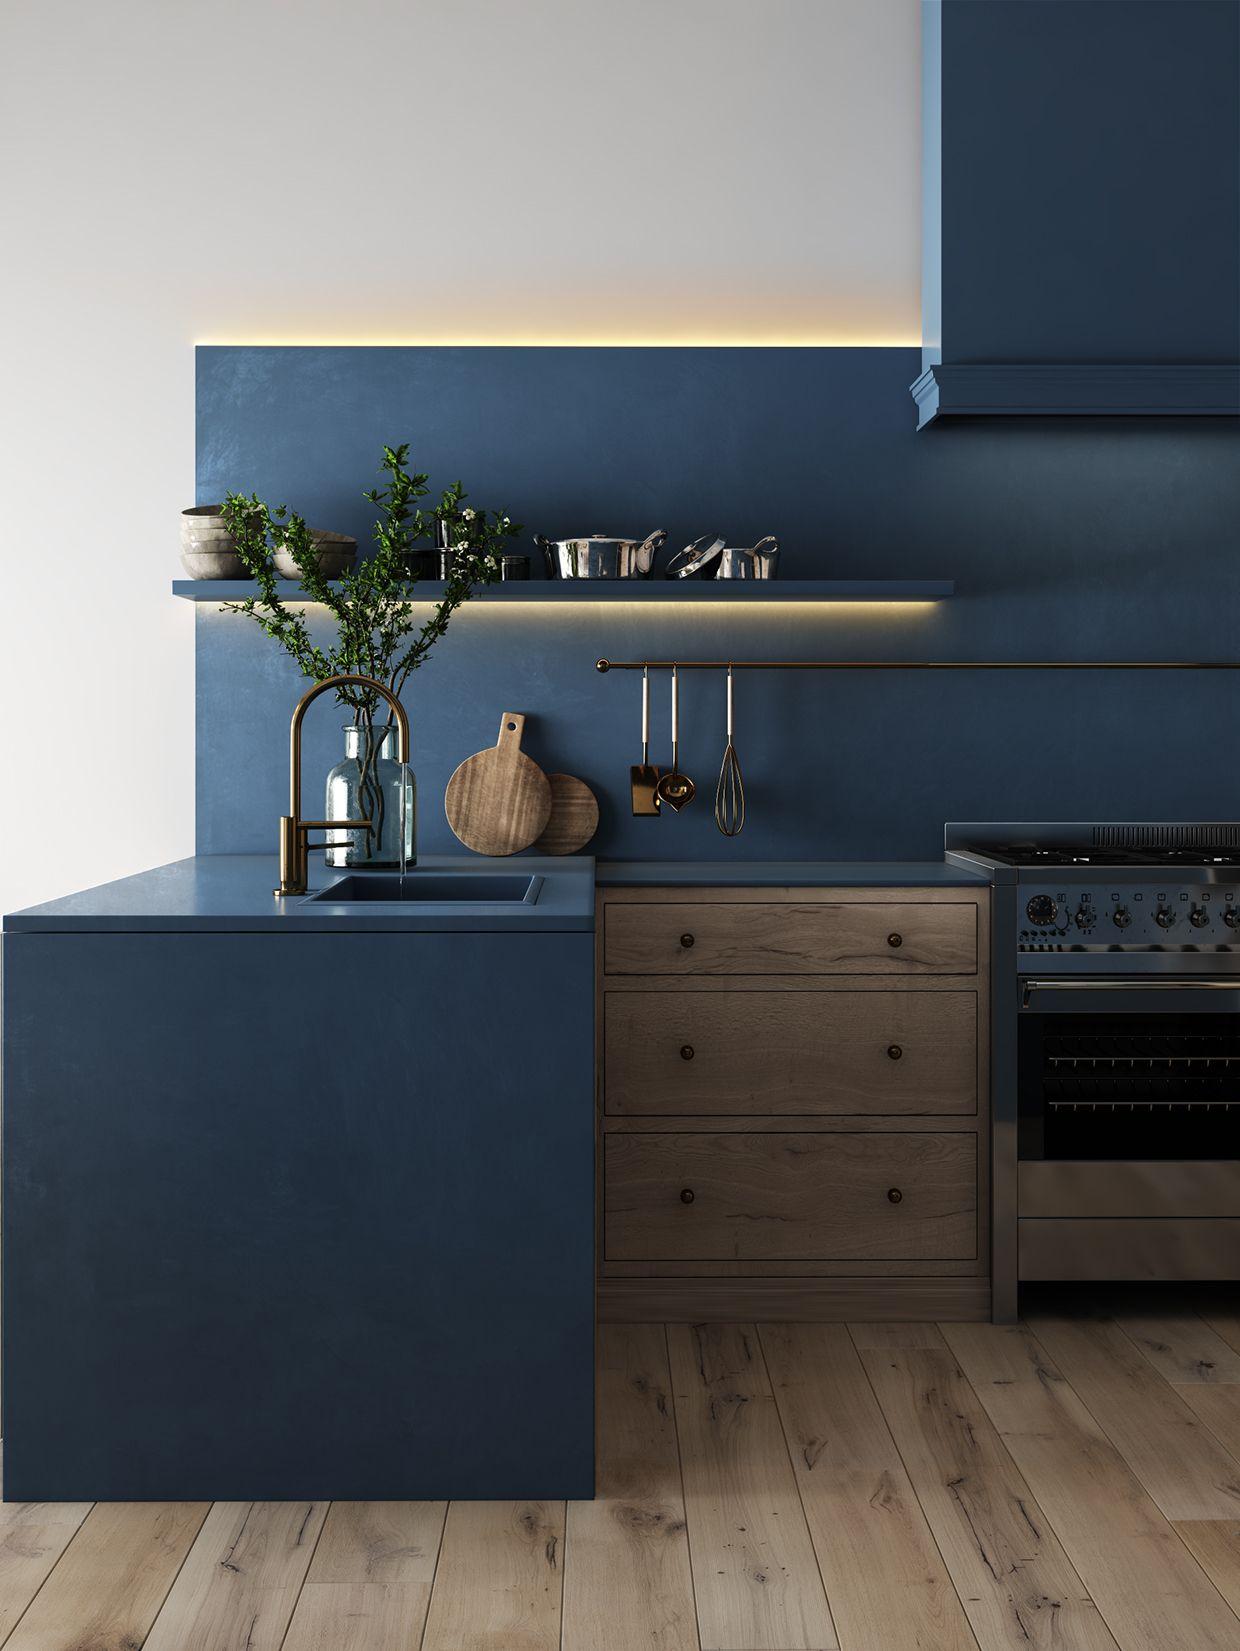 Pin by marco brentegani on kitchen ideas in pinterest